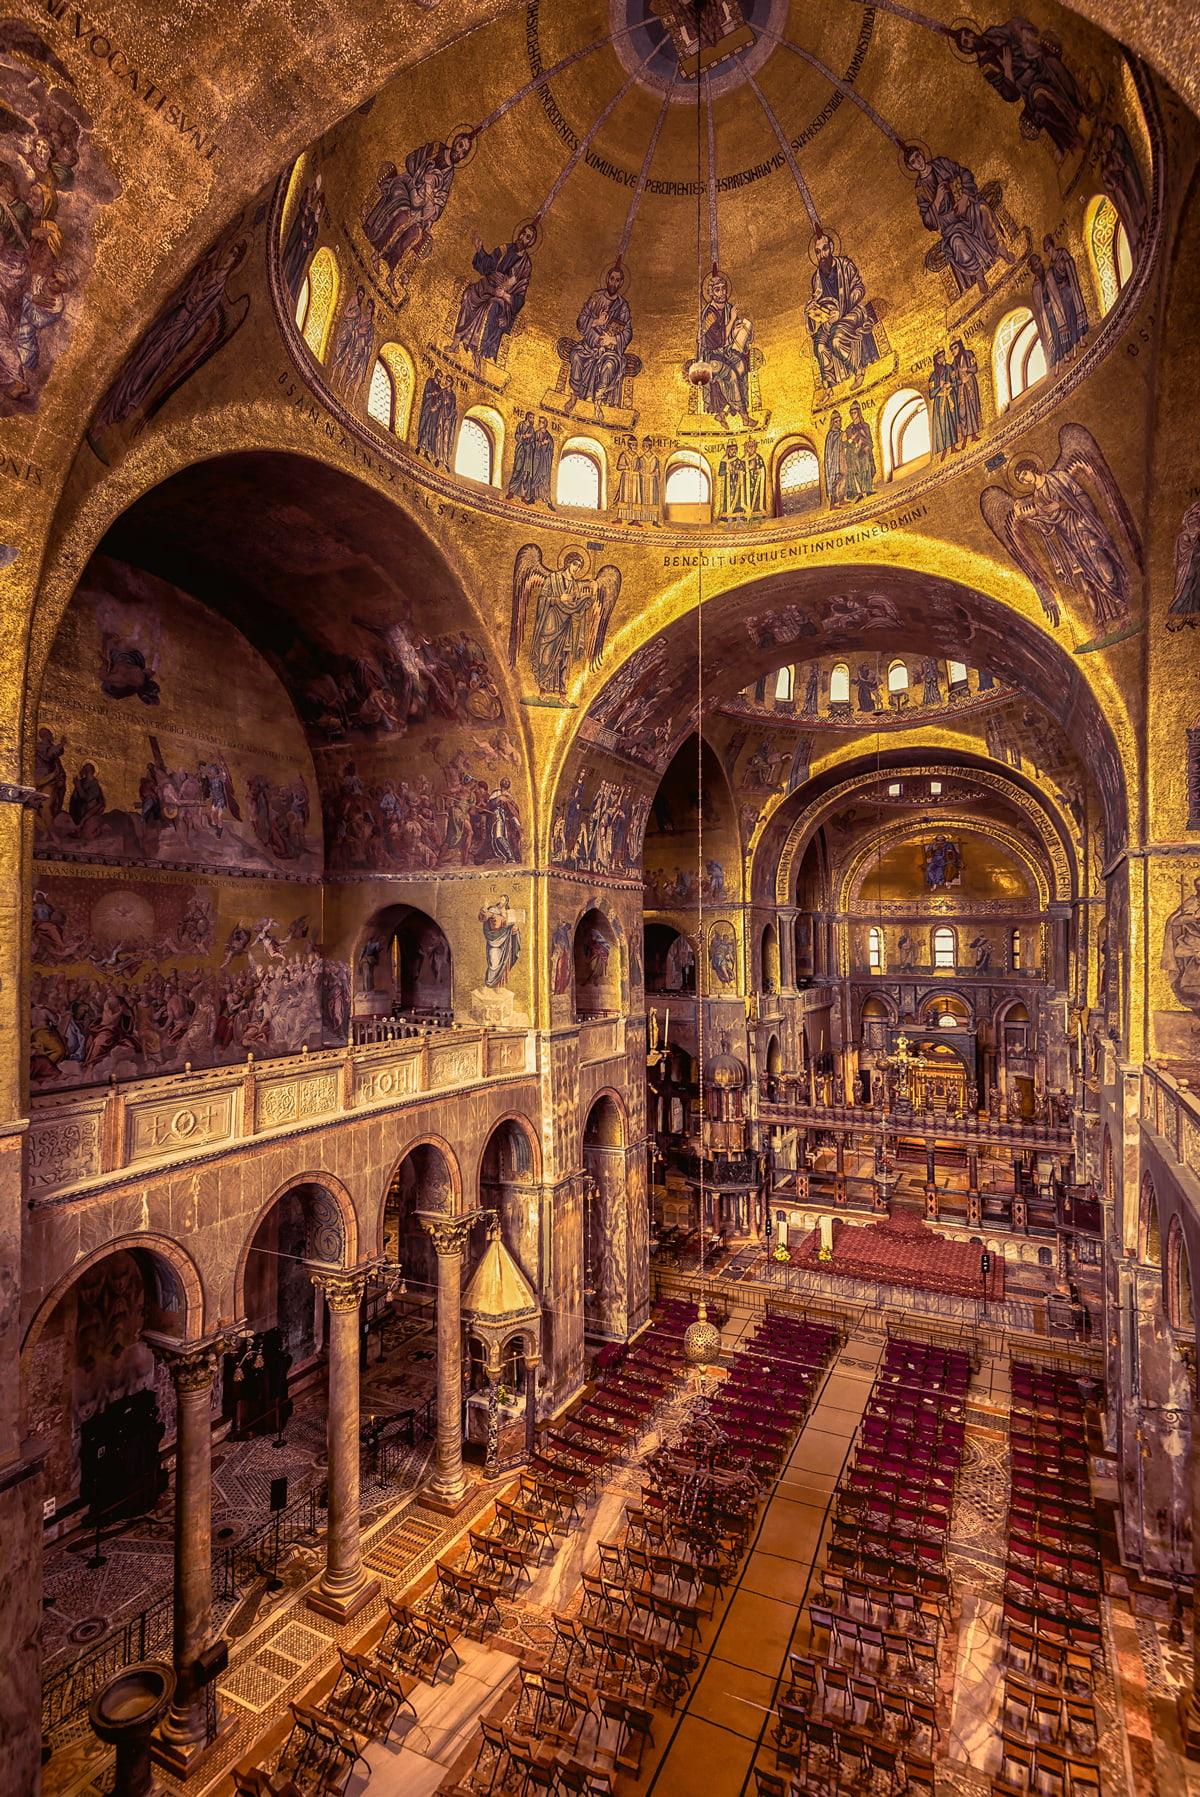 St Mark's Basilica Interiors